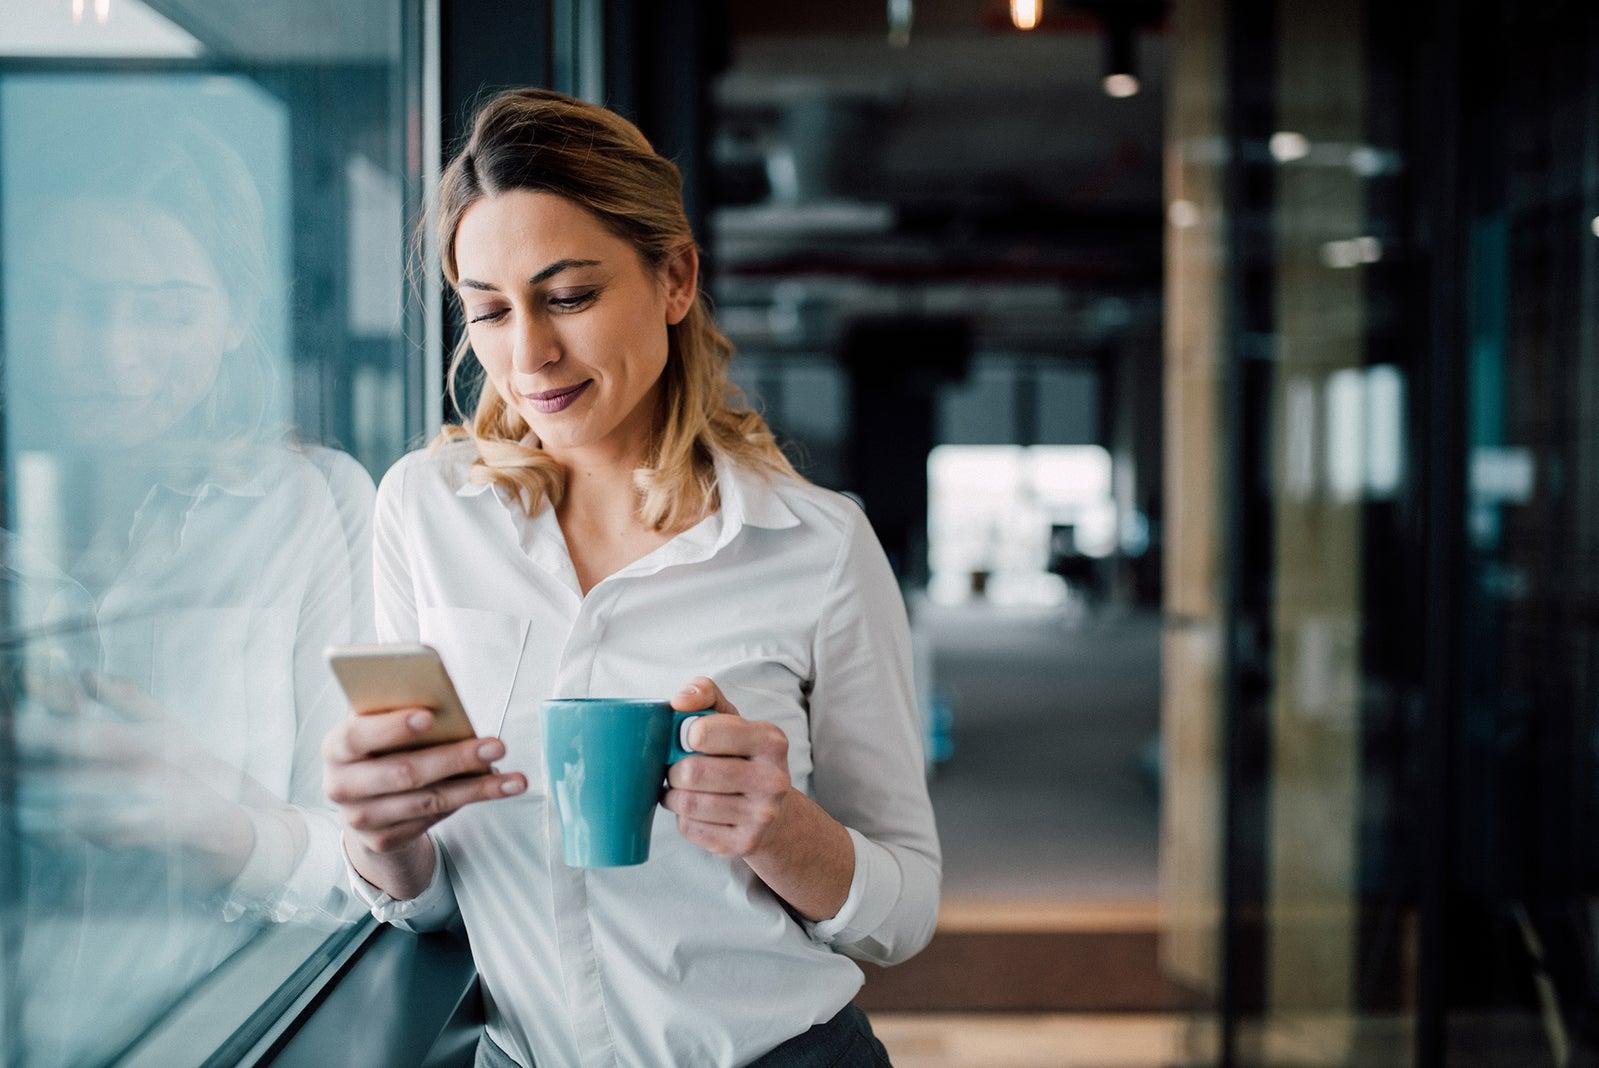 Gartner Peer Insights 'Voice of the Customer' Web Content Management 2019